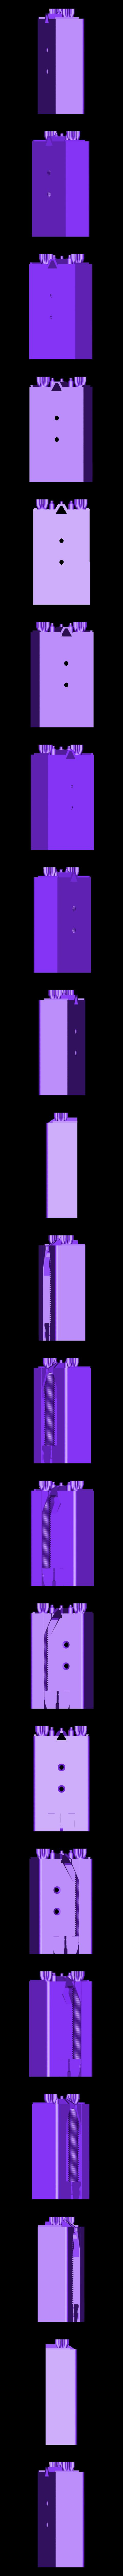 DISPENSER BLOC (x1).stl Download free STL file Toothpaste Dispenser • 3D print model, Anthony_SA